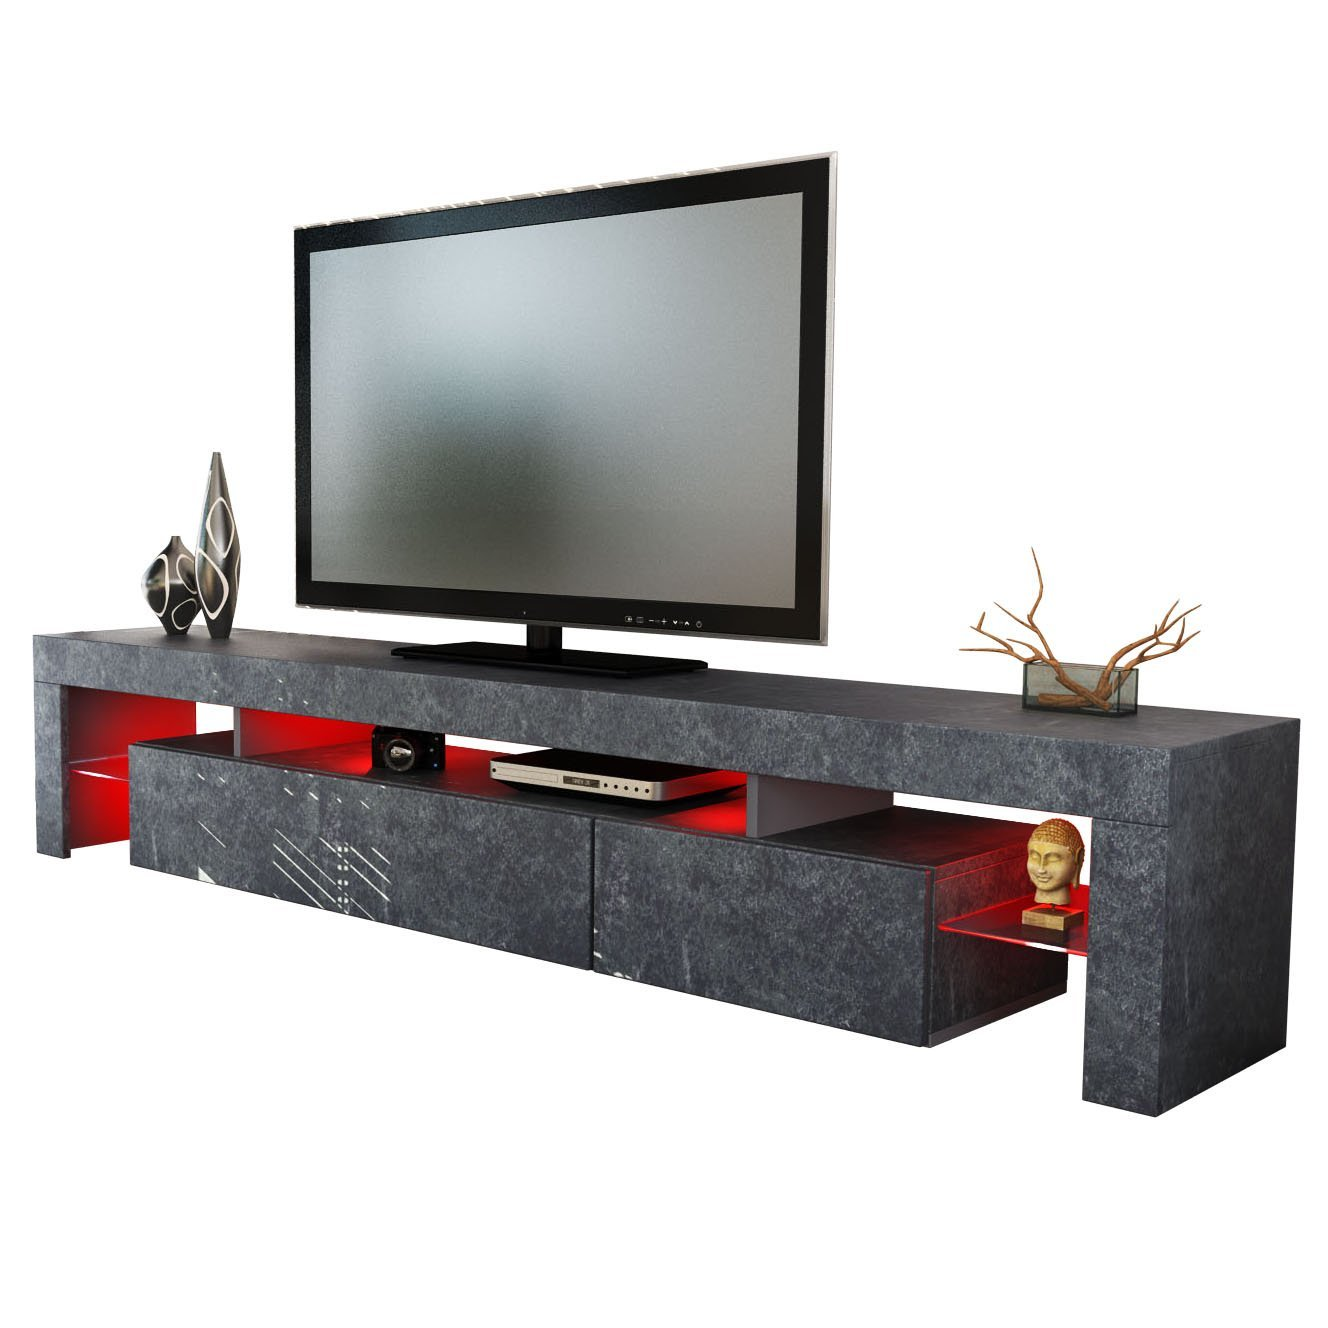 Tv Bank Grau ~ ▻ tv lowboard grau tv lowboard schrank für den fernseher